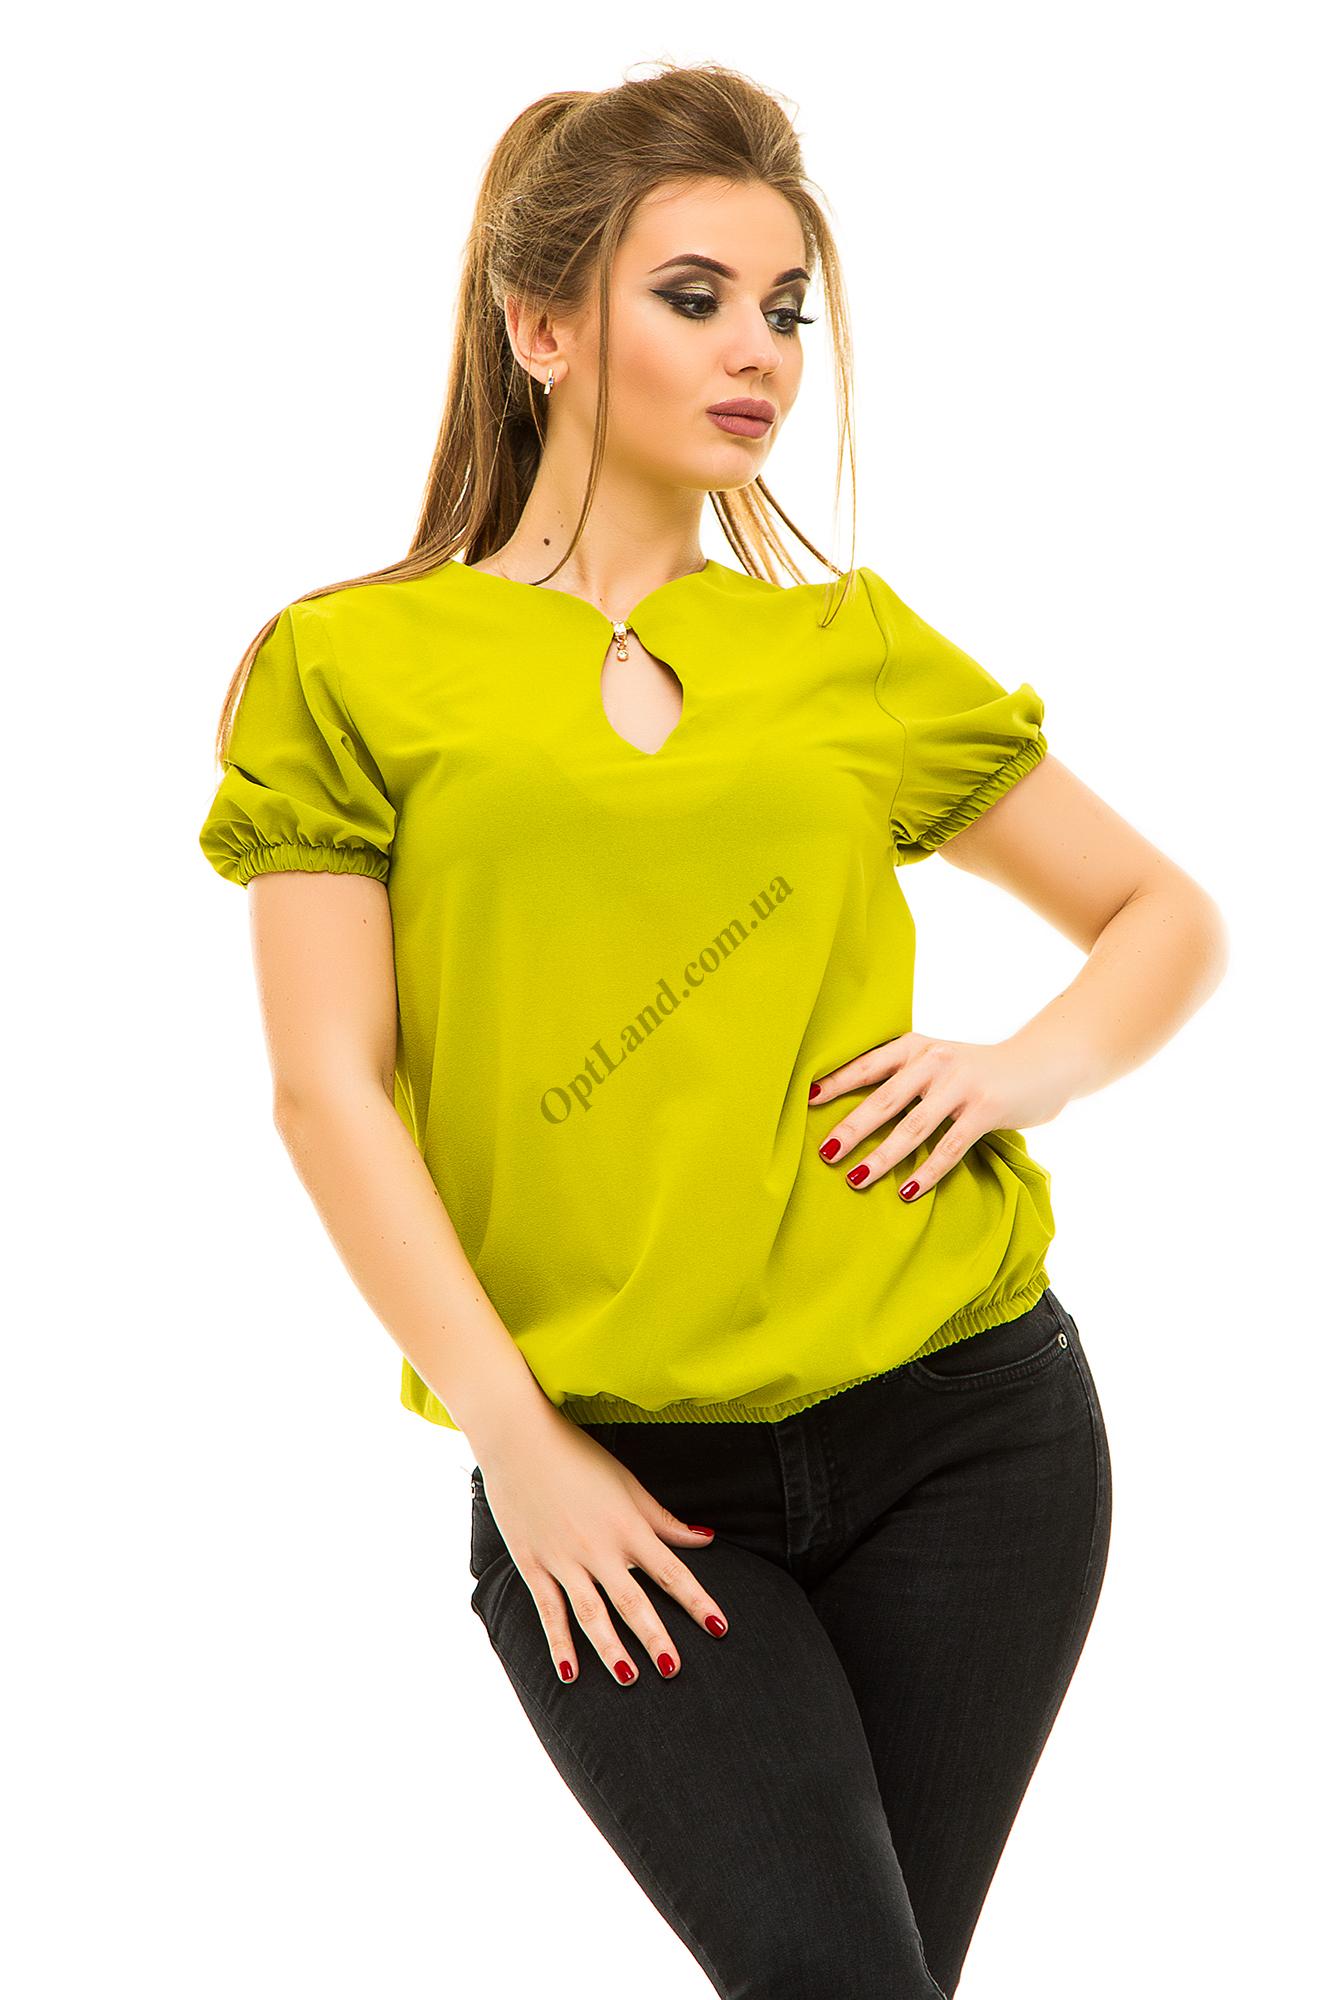 Женские рубашки и блузы оптом